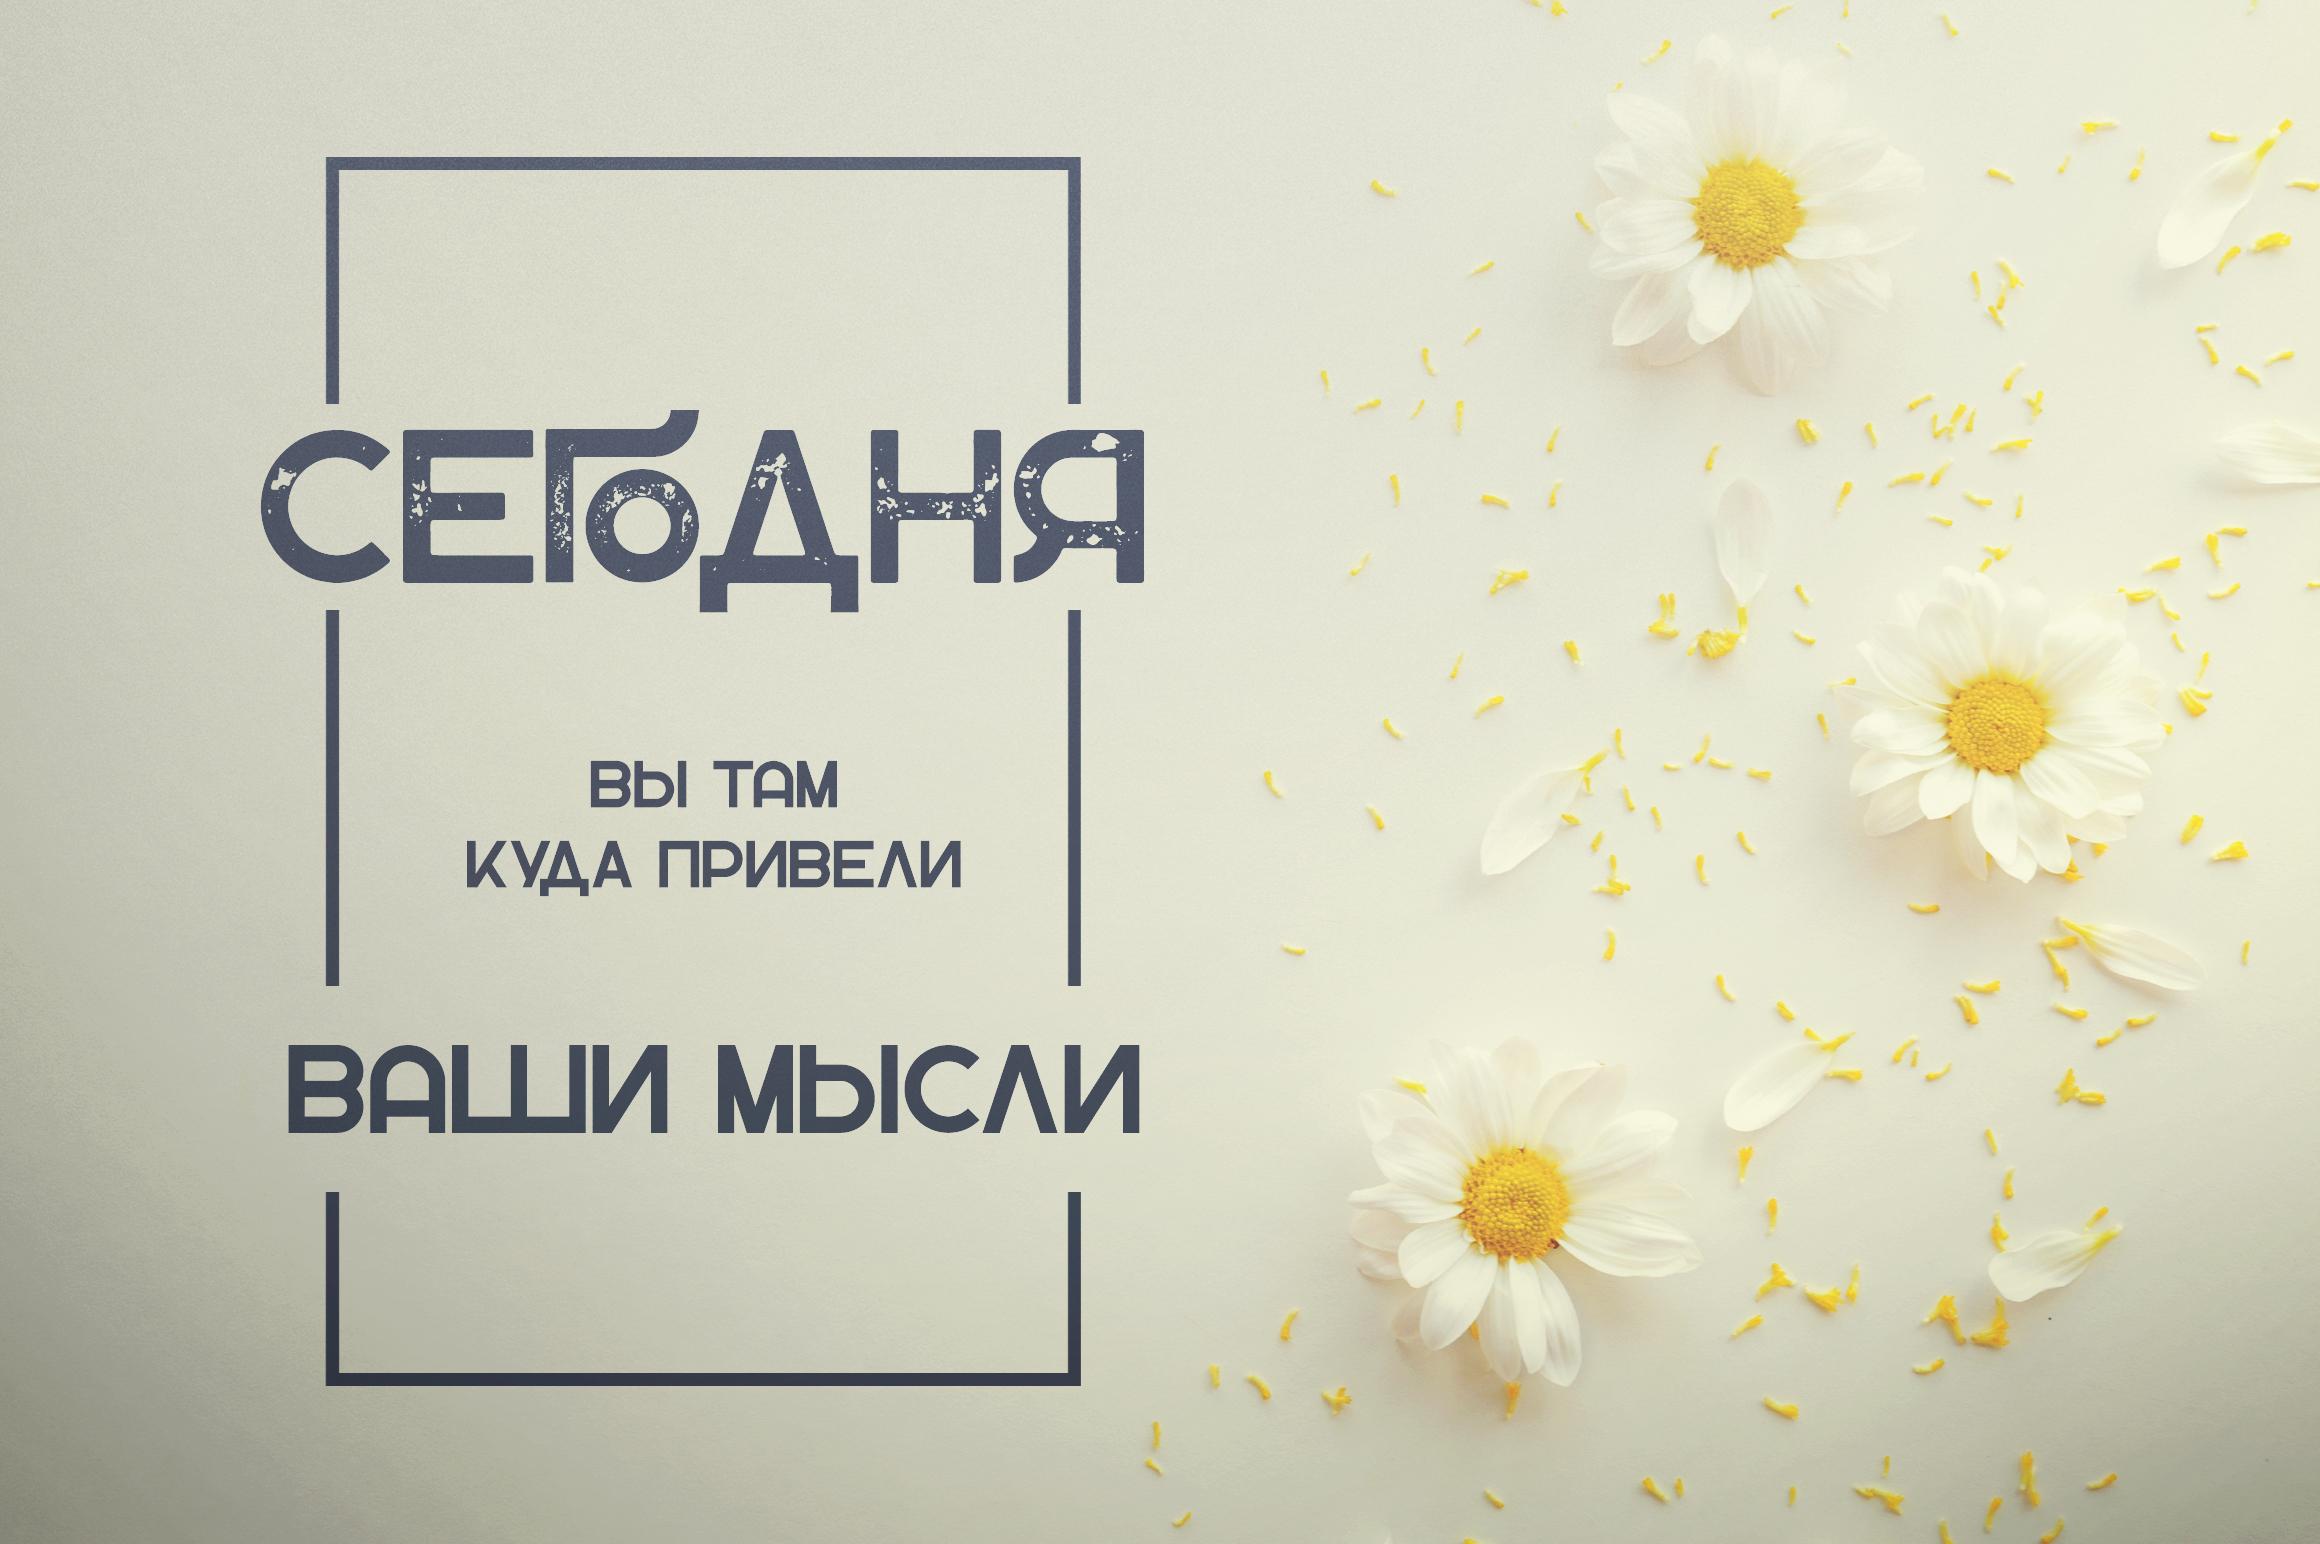 Greenth Display   Latin & Cyrillic example image 7